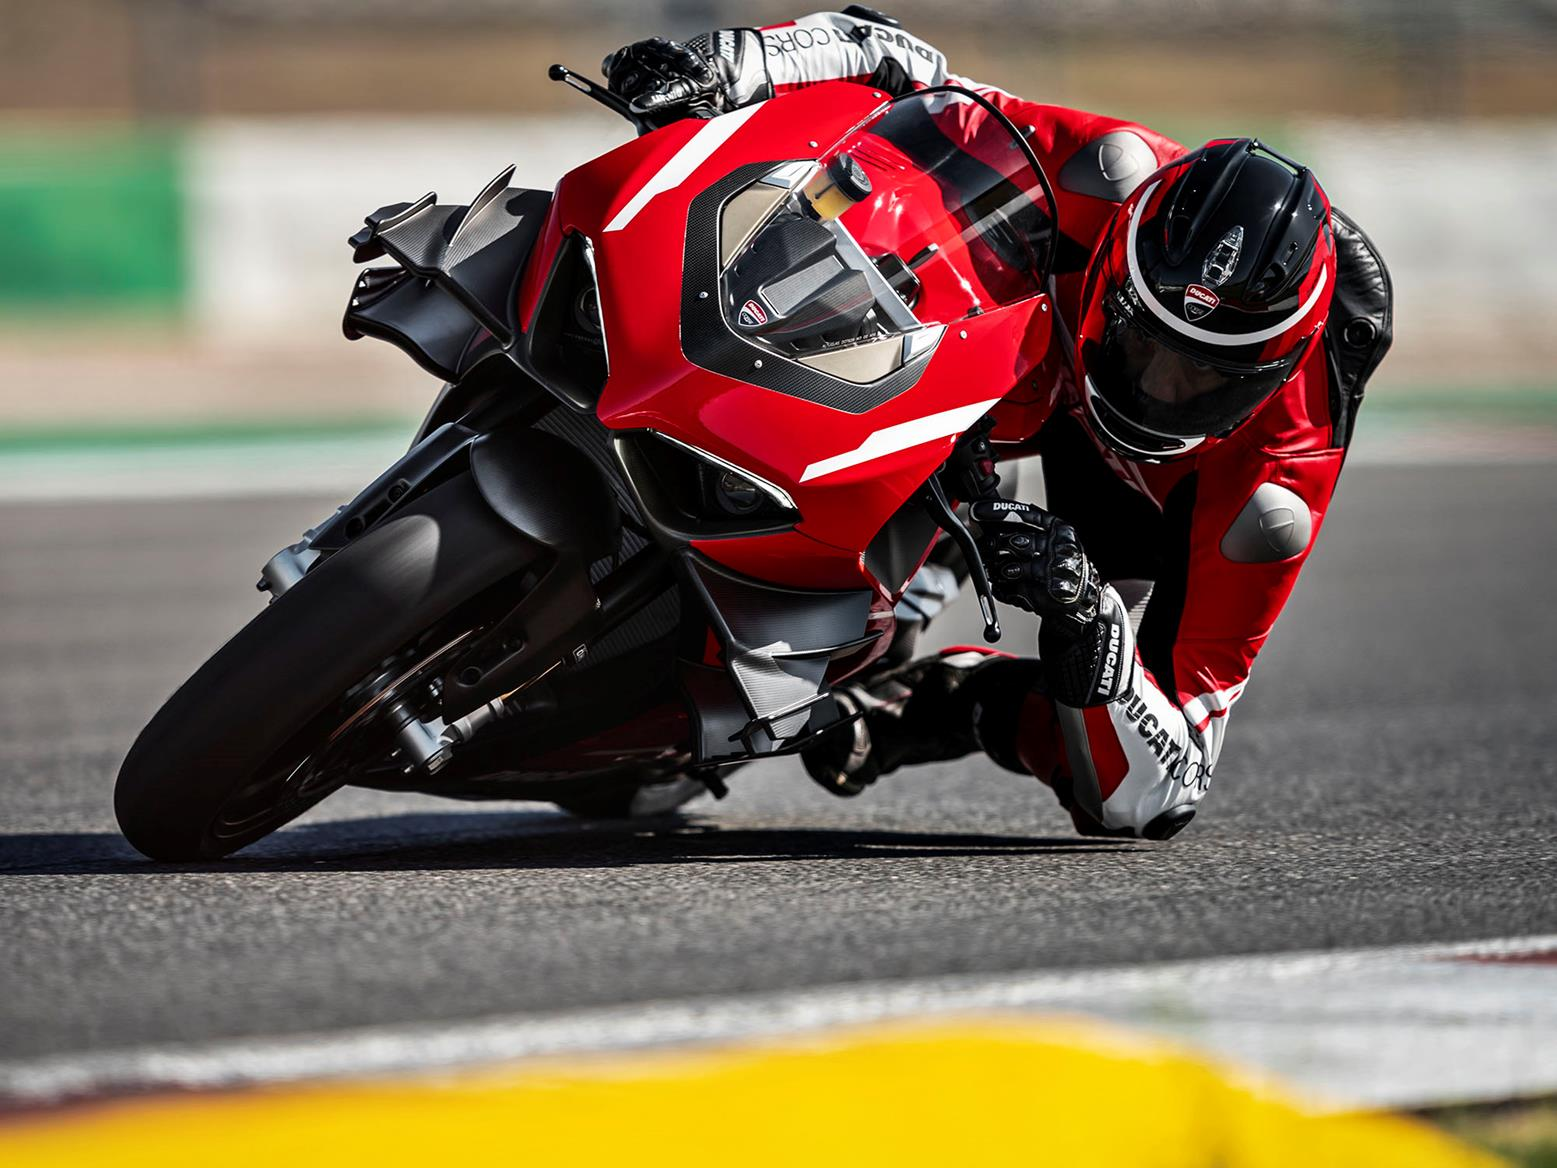 Ducati Superleggera V4 on the track